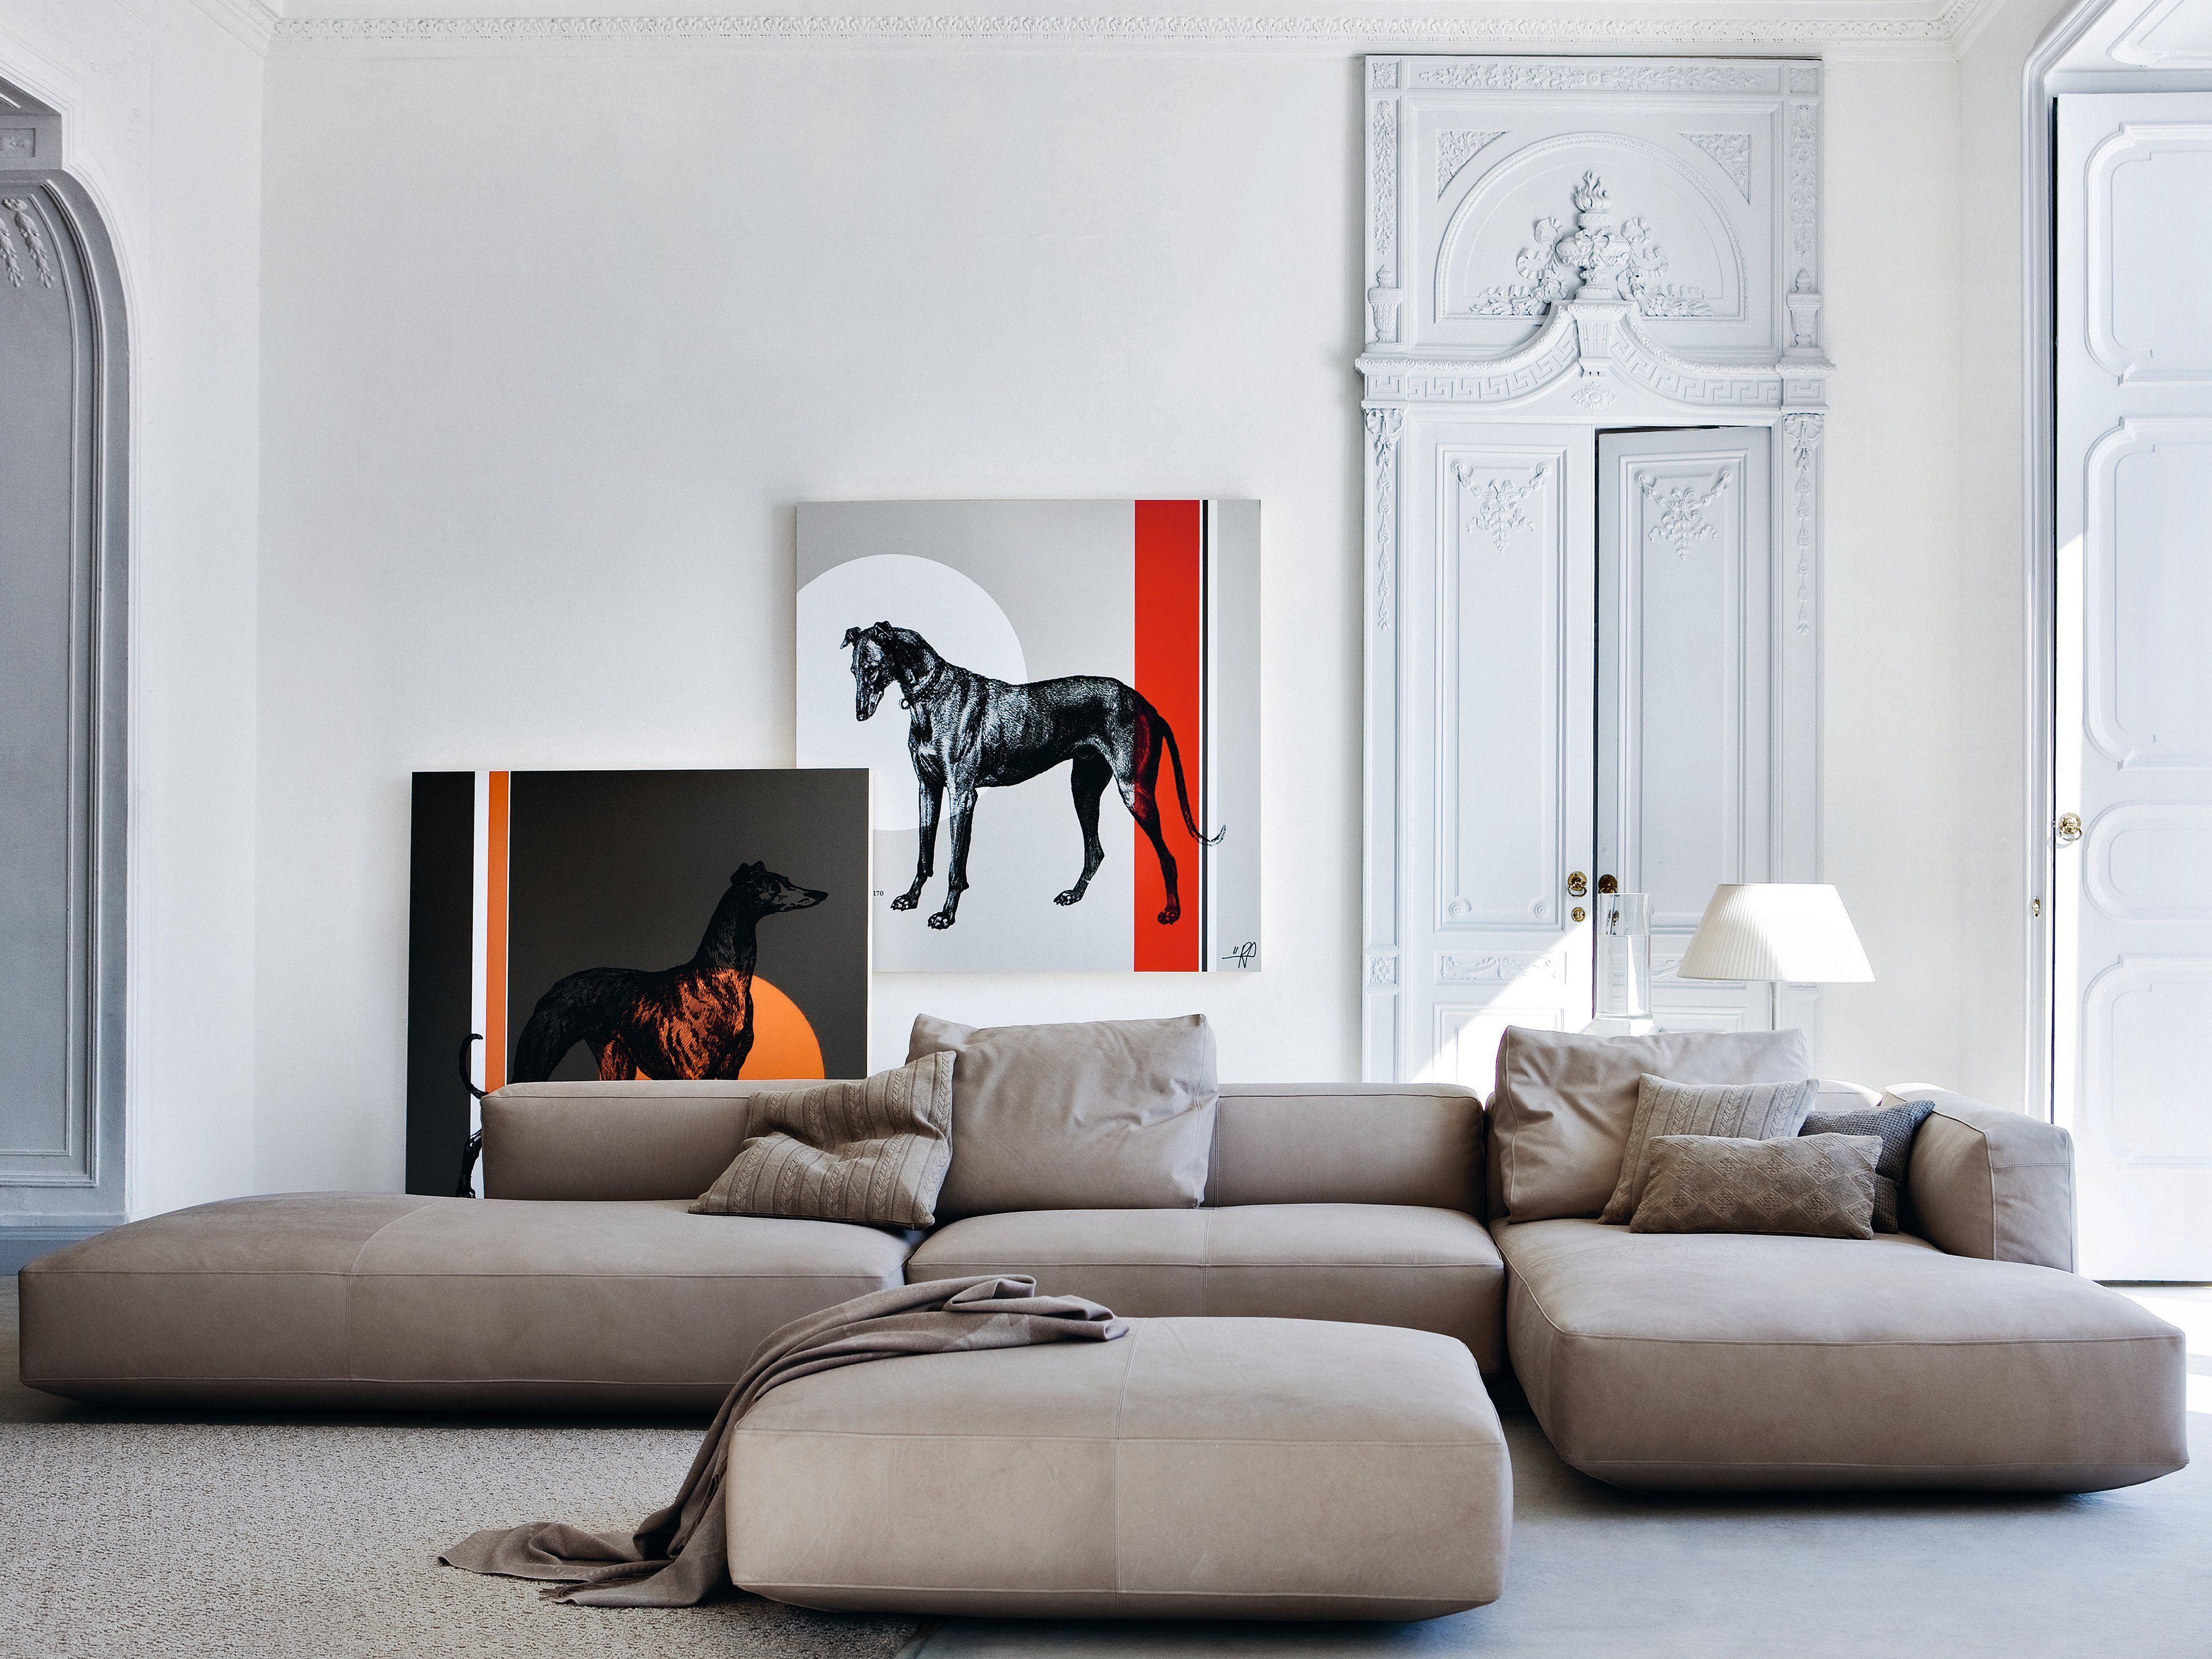 Sectional upholstered sofa PIANOALTO by Zanotta | design Ludovica ...